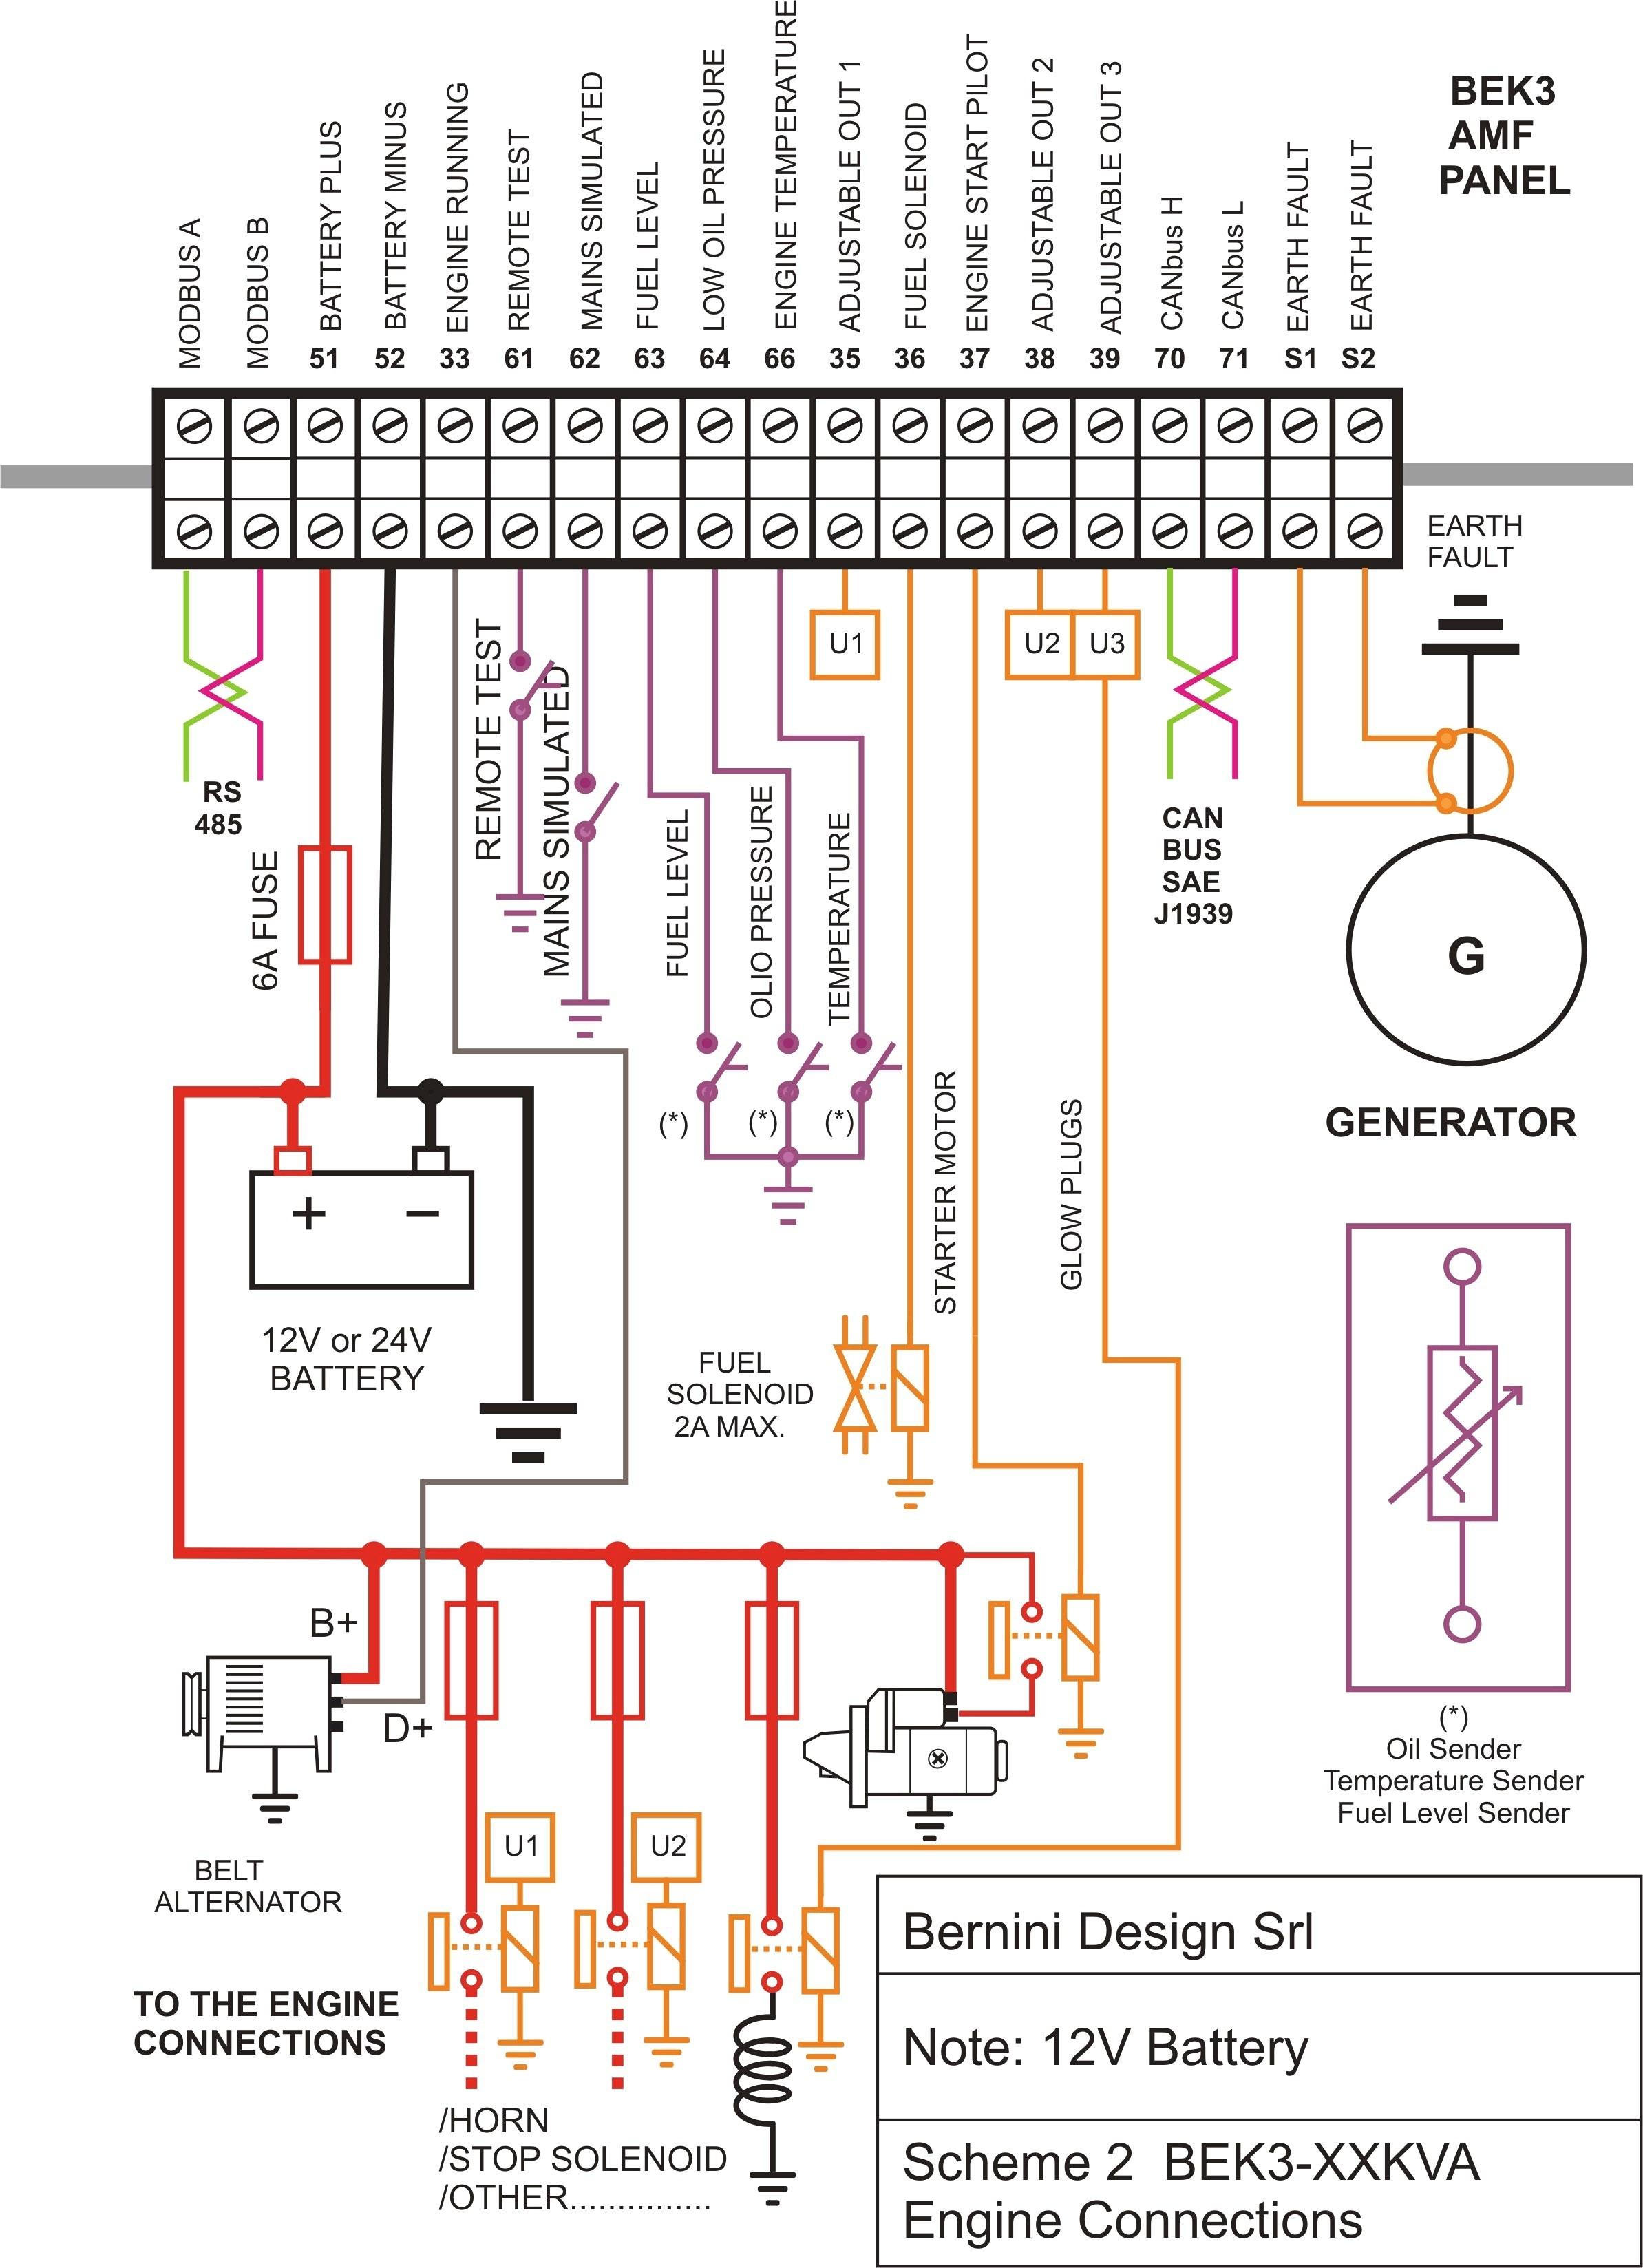 Engine Test Stand Wiring Diagram Inspiration Test Block Wiring Diagram Irelandnews Of Engine Test Stand Wiring Diagram